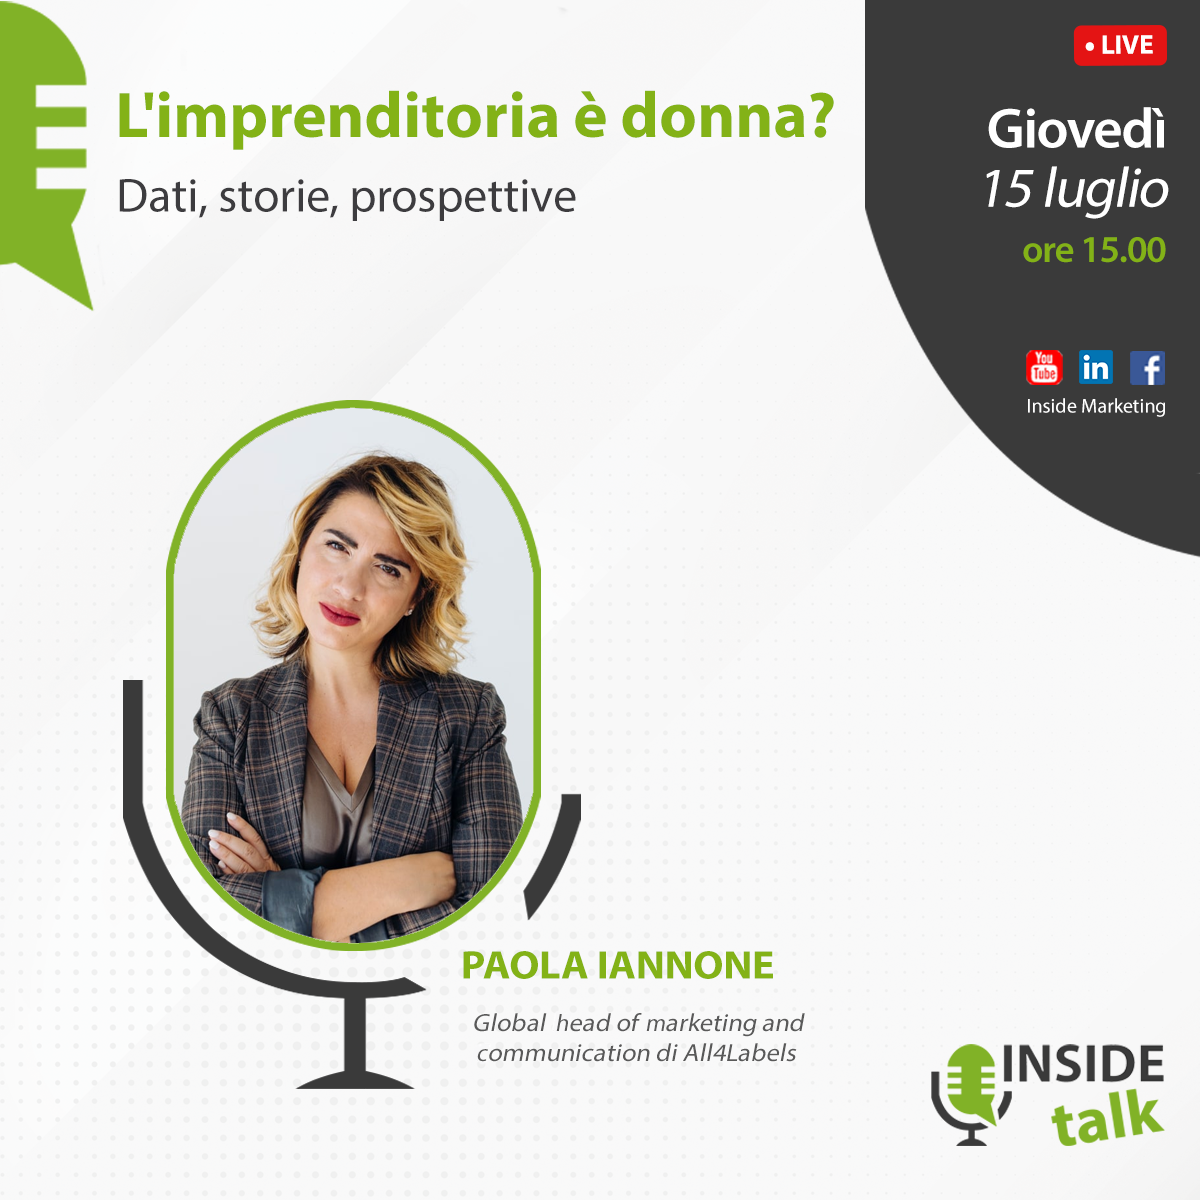 Dati, storie, prospettive. Paola Iannone